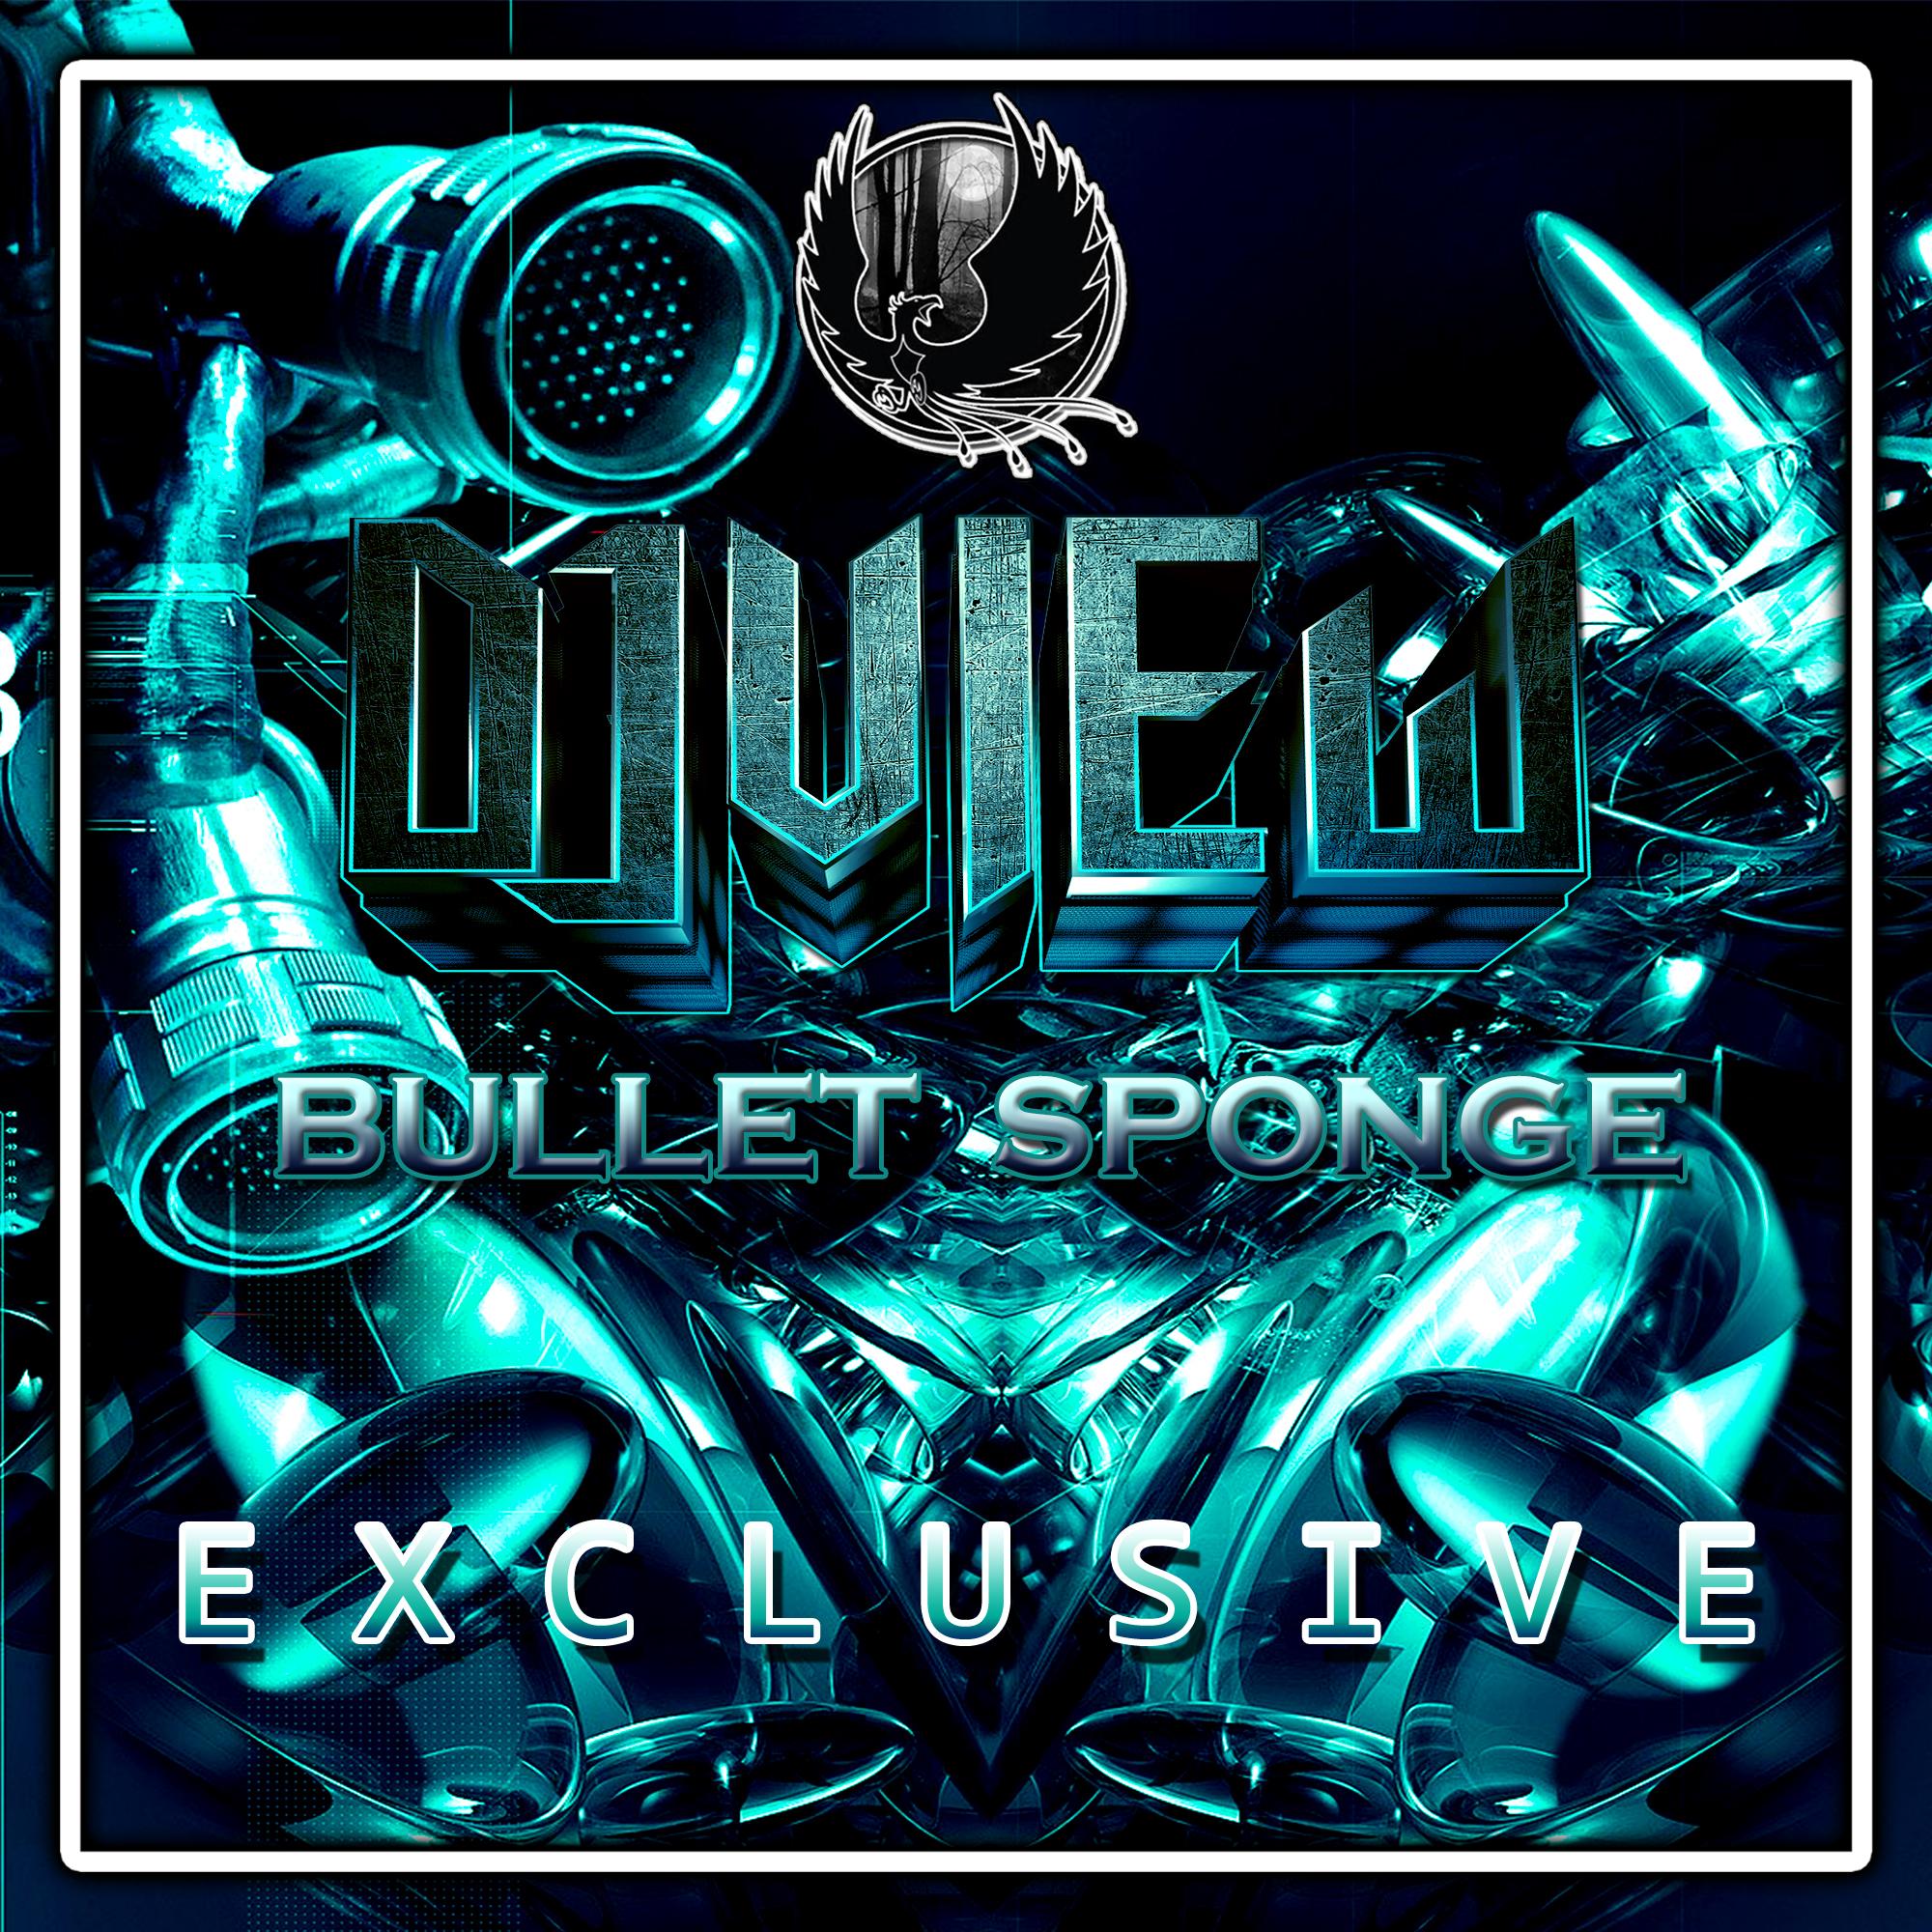 djview_bullet_spongeV2_2000x2000.jpg